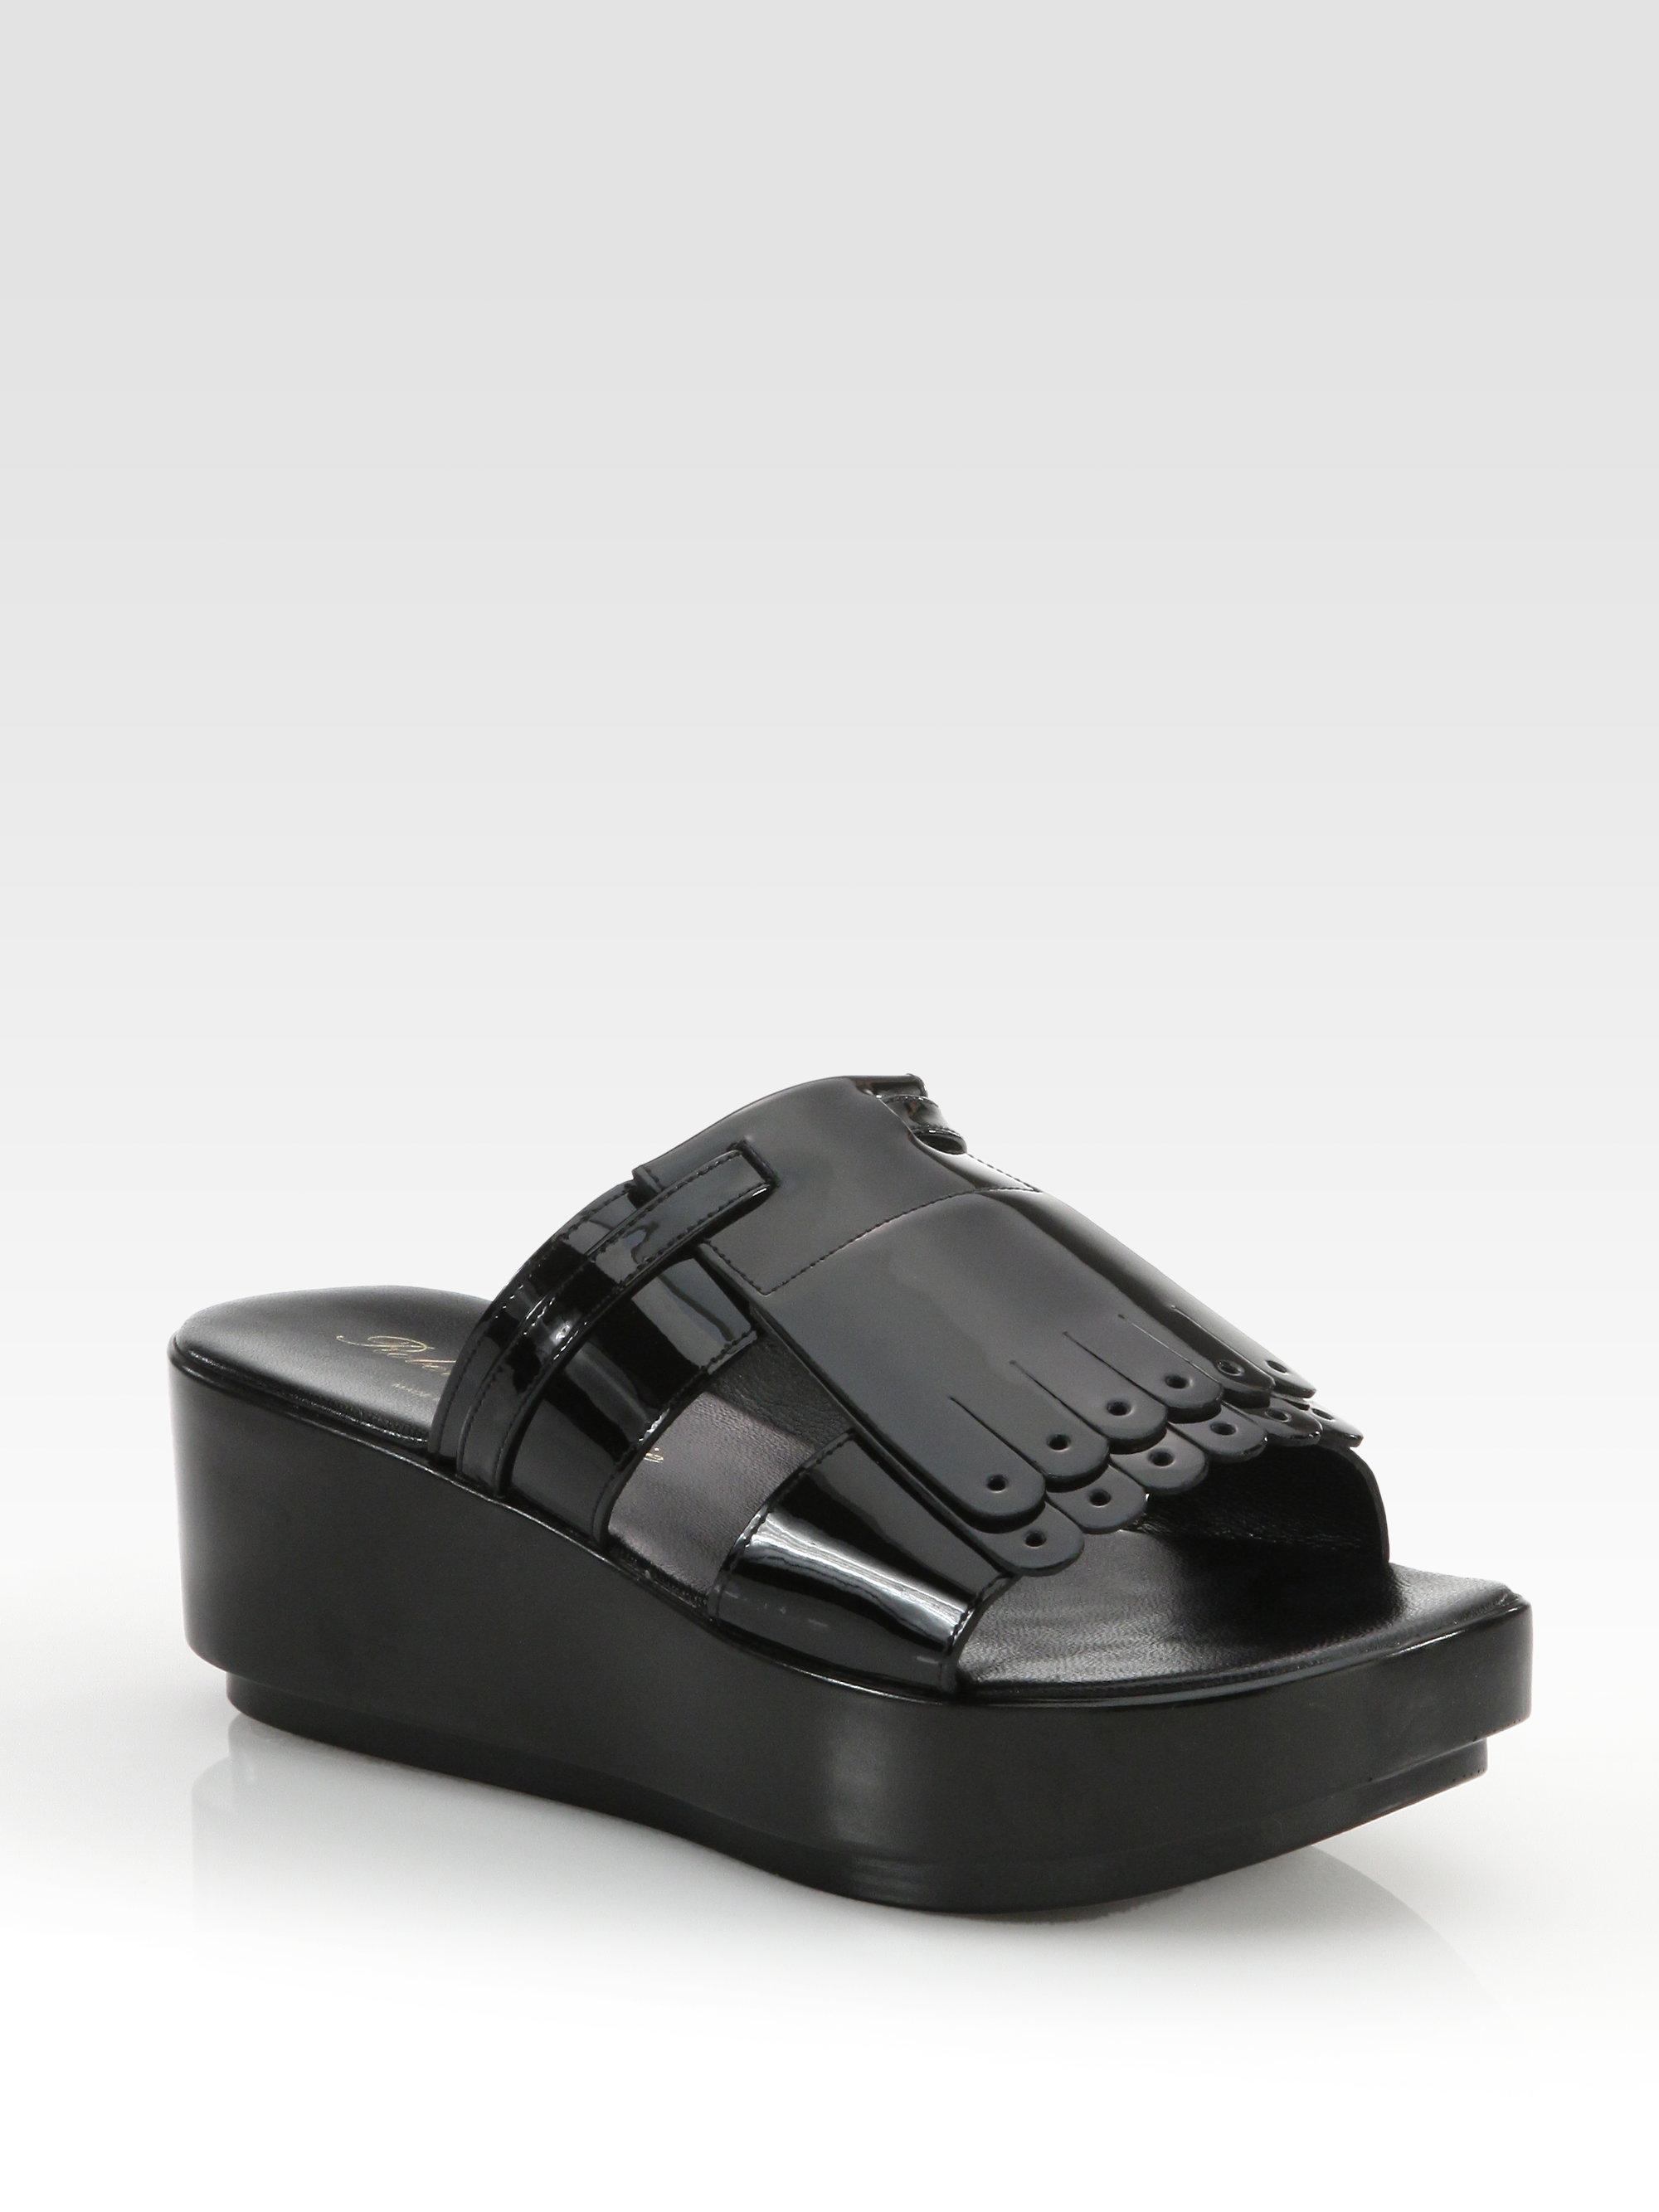 Robert Clergerie Patent Leather Sandal qJtwv4x